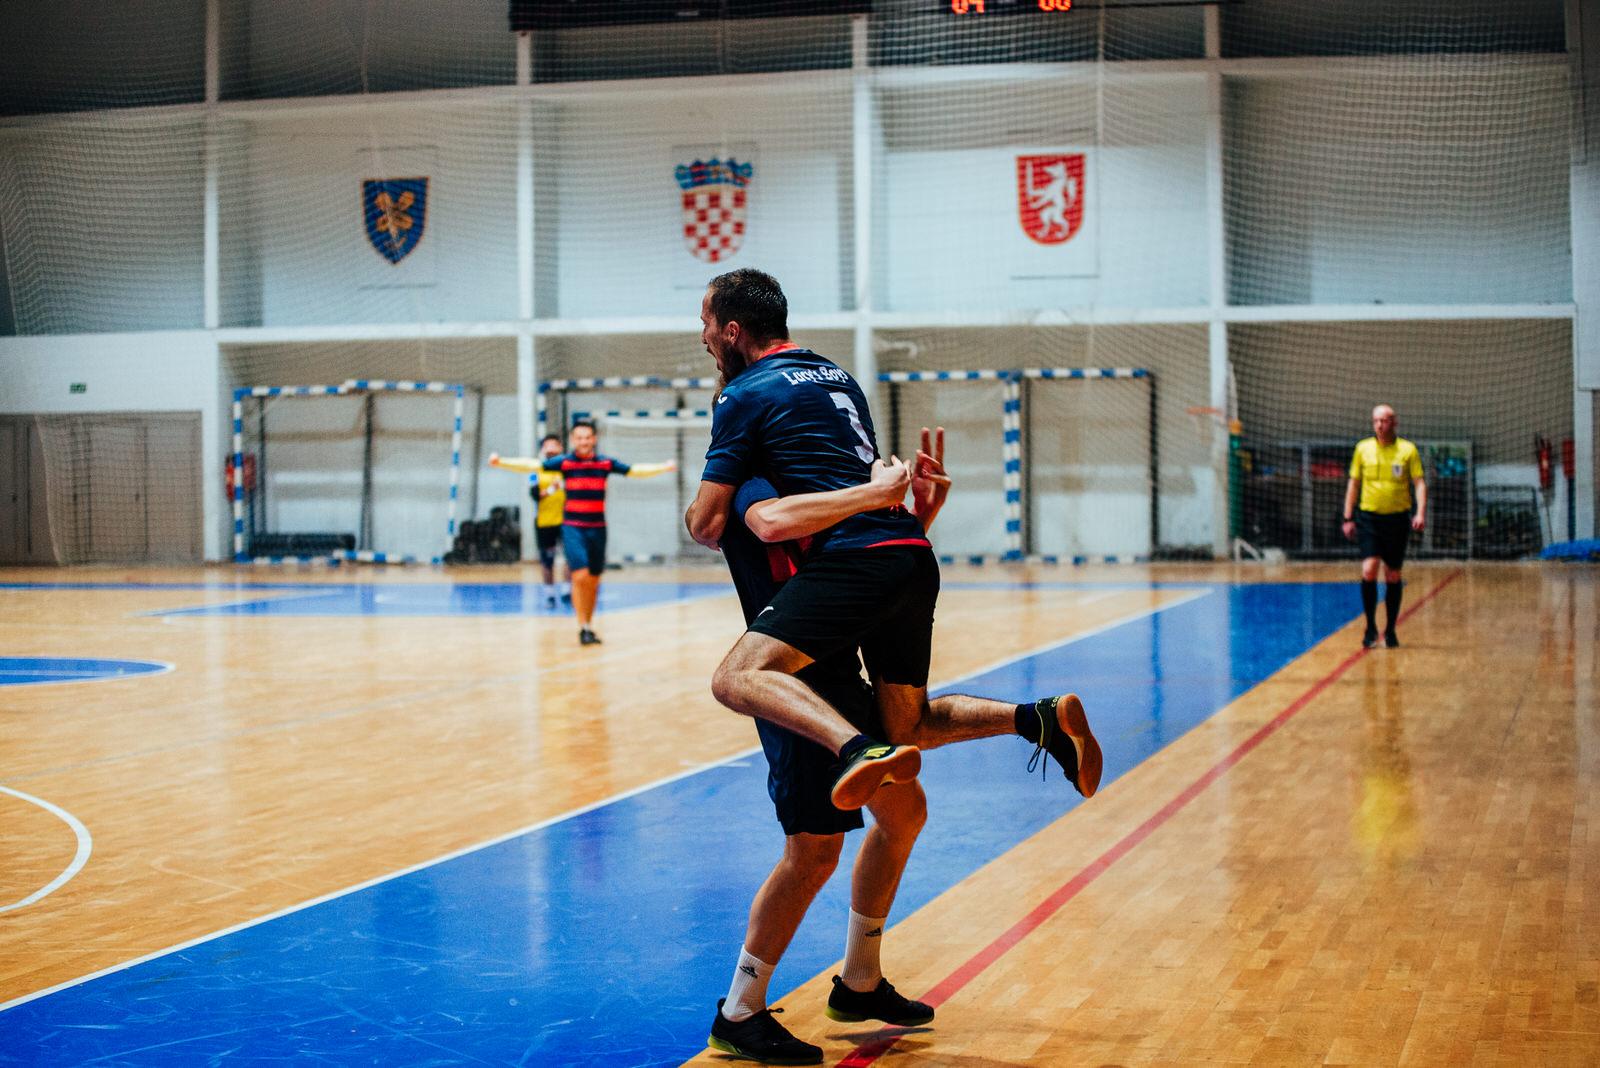 likaclub_zimska-malonogometna-liga-gospić_2019-20-99